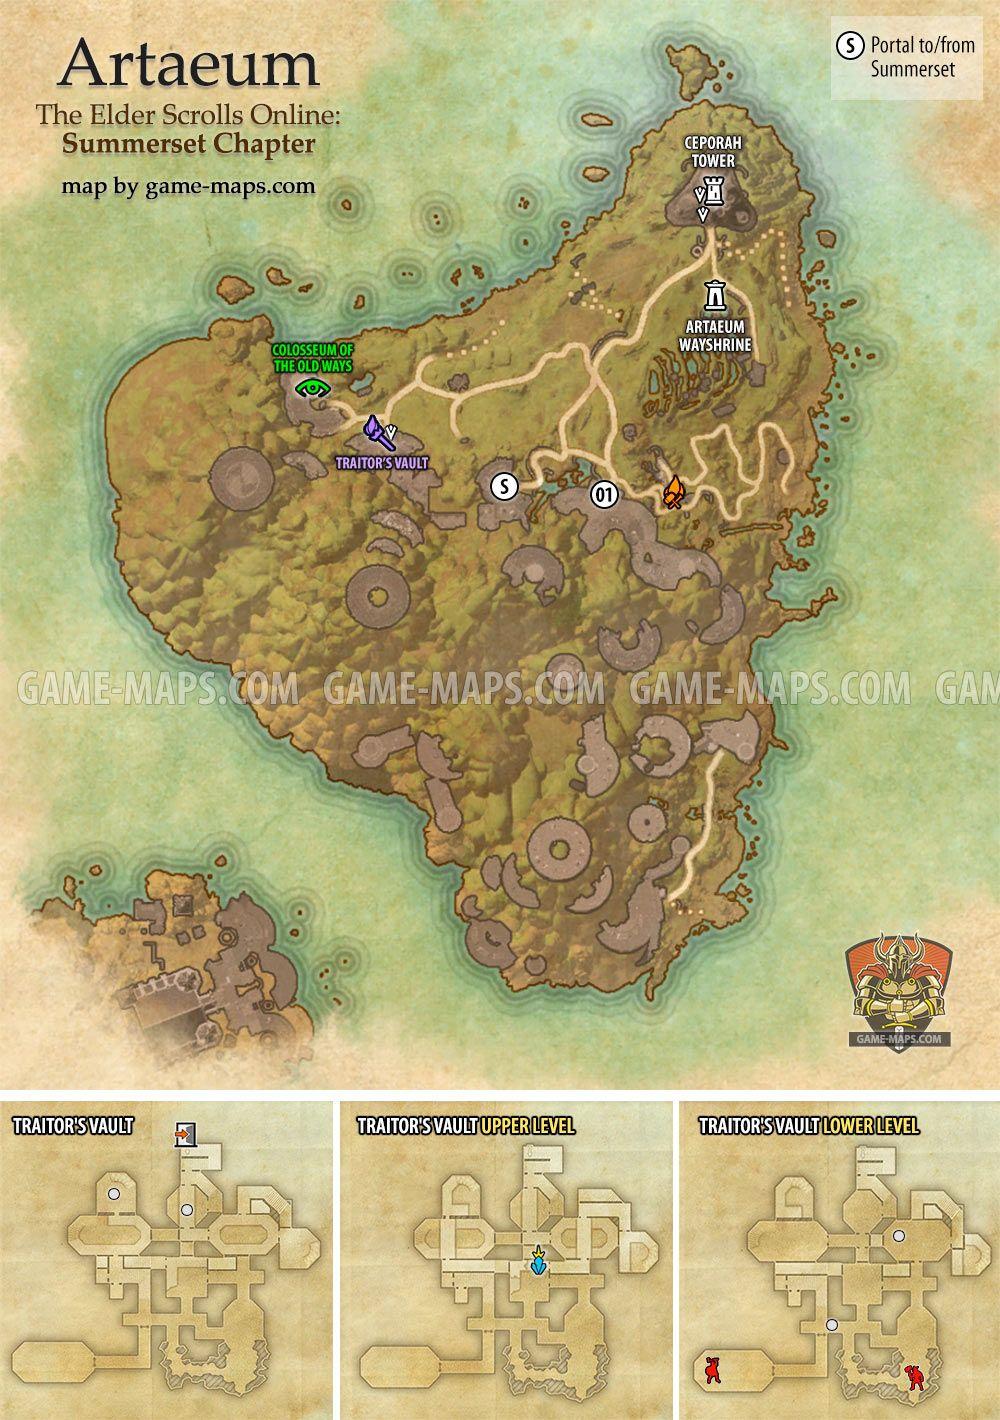 Artaeum zone map for The Elder Scrolls Online: Summerset. Delves ...